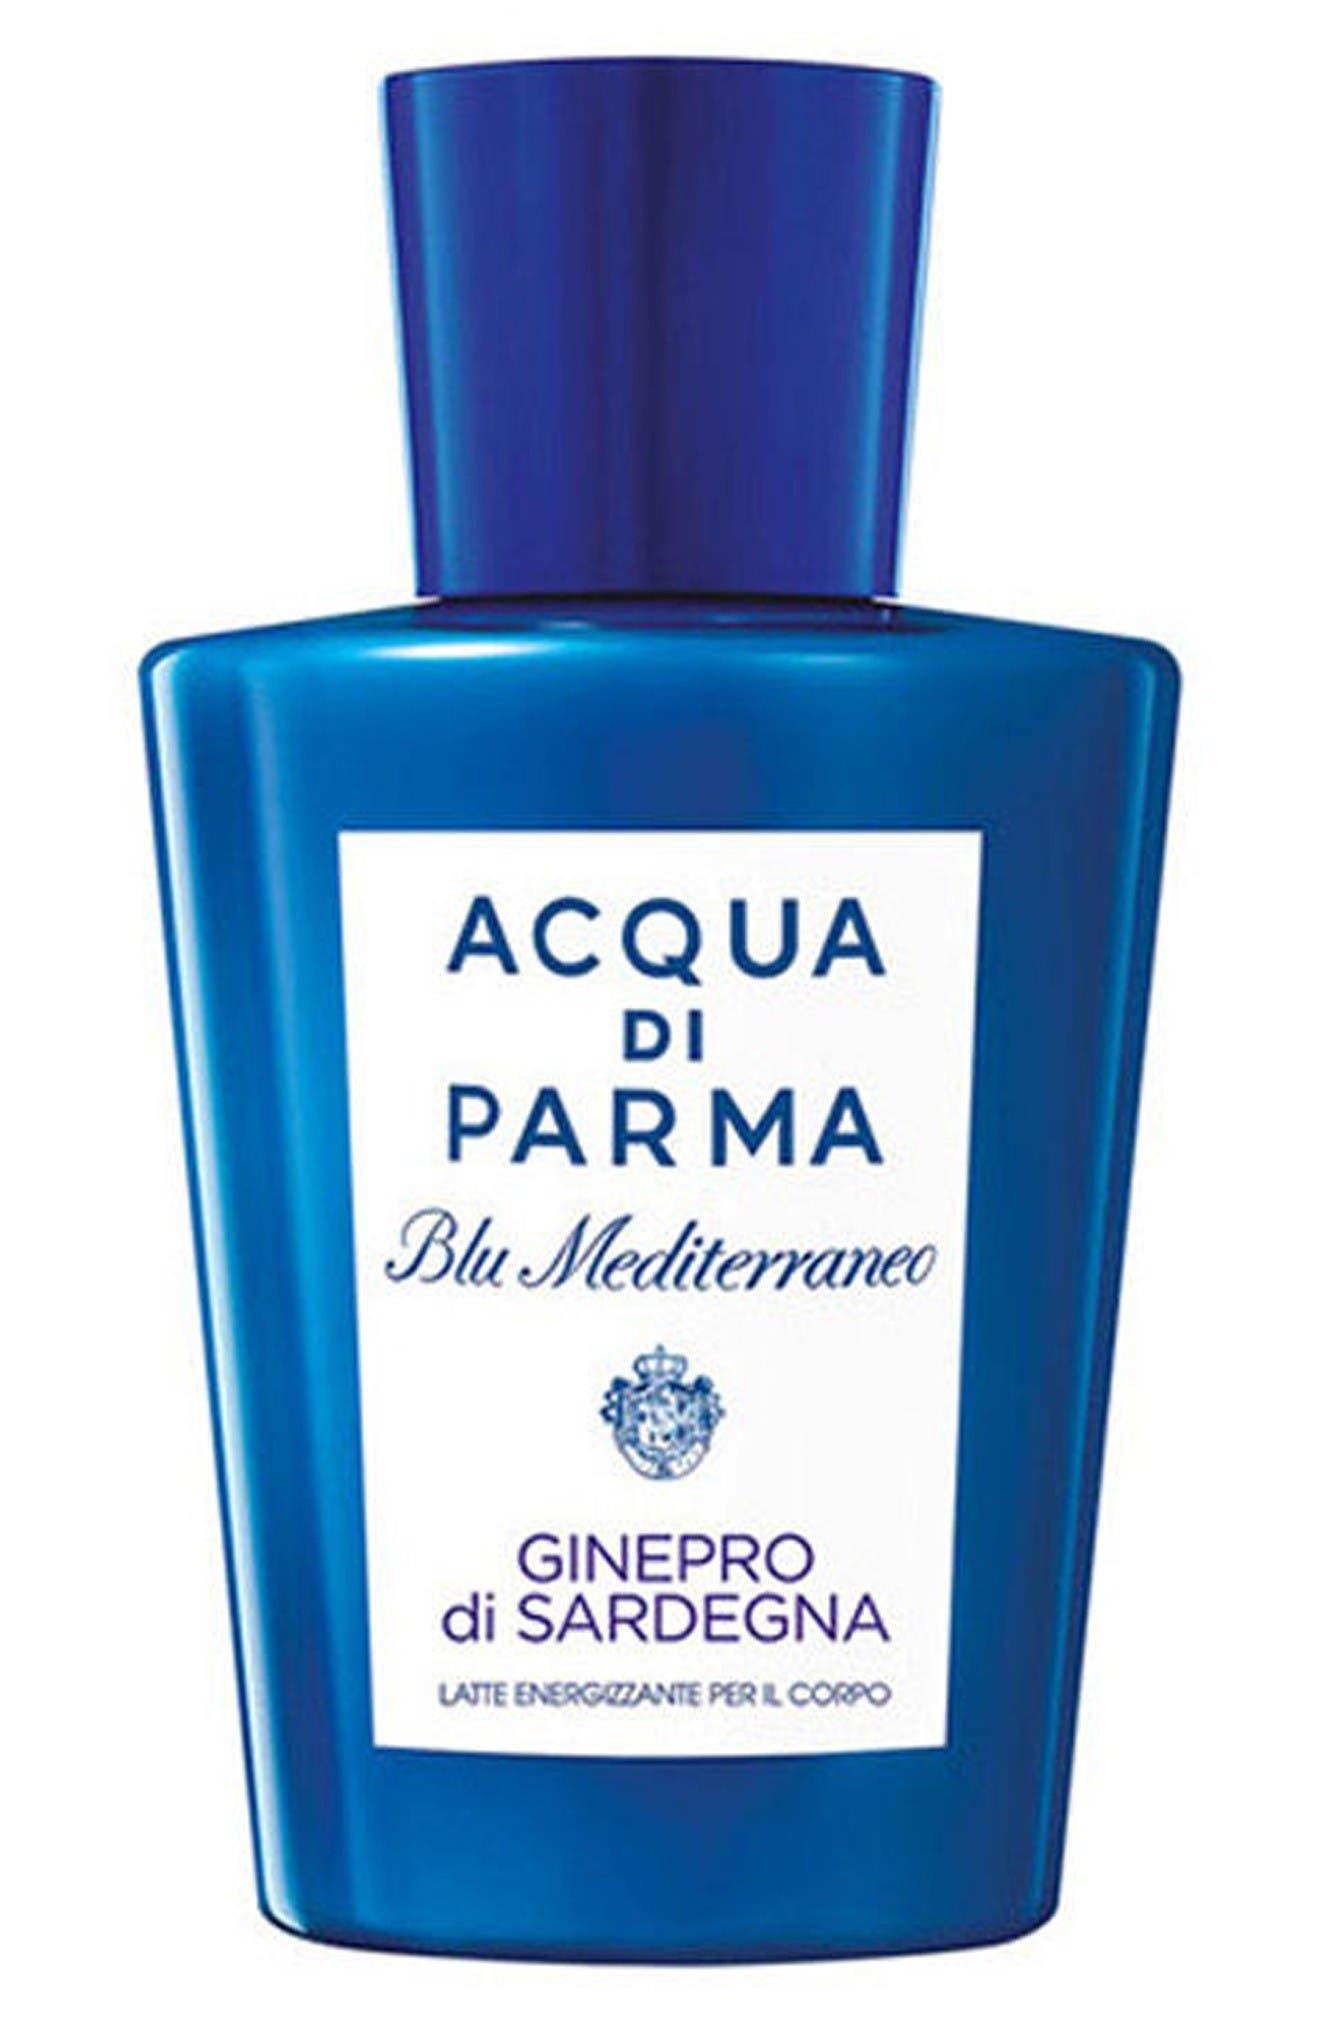 Alternate Image 1 Selected - Acqua di Parma 'Blu Mediterraneo - Ginepro di Sardegna' Energizing Body Lotion